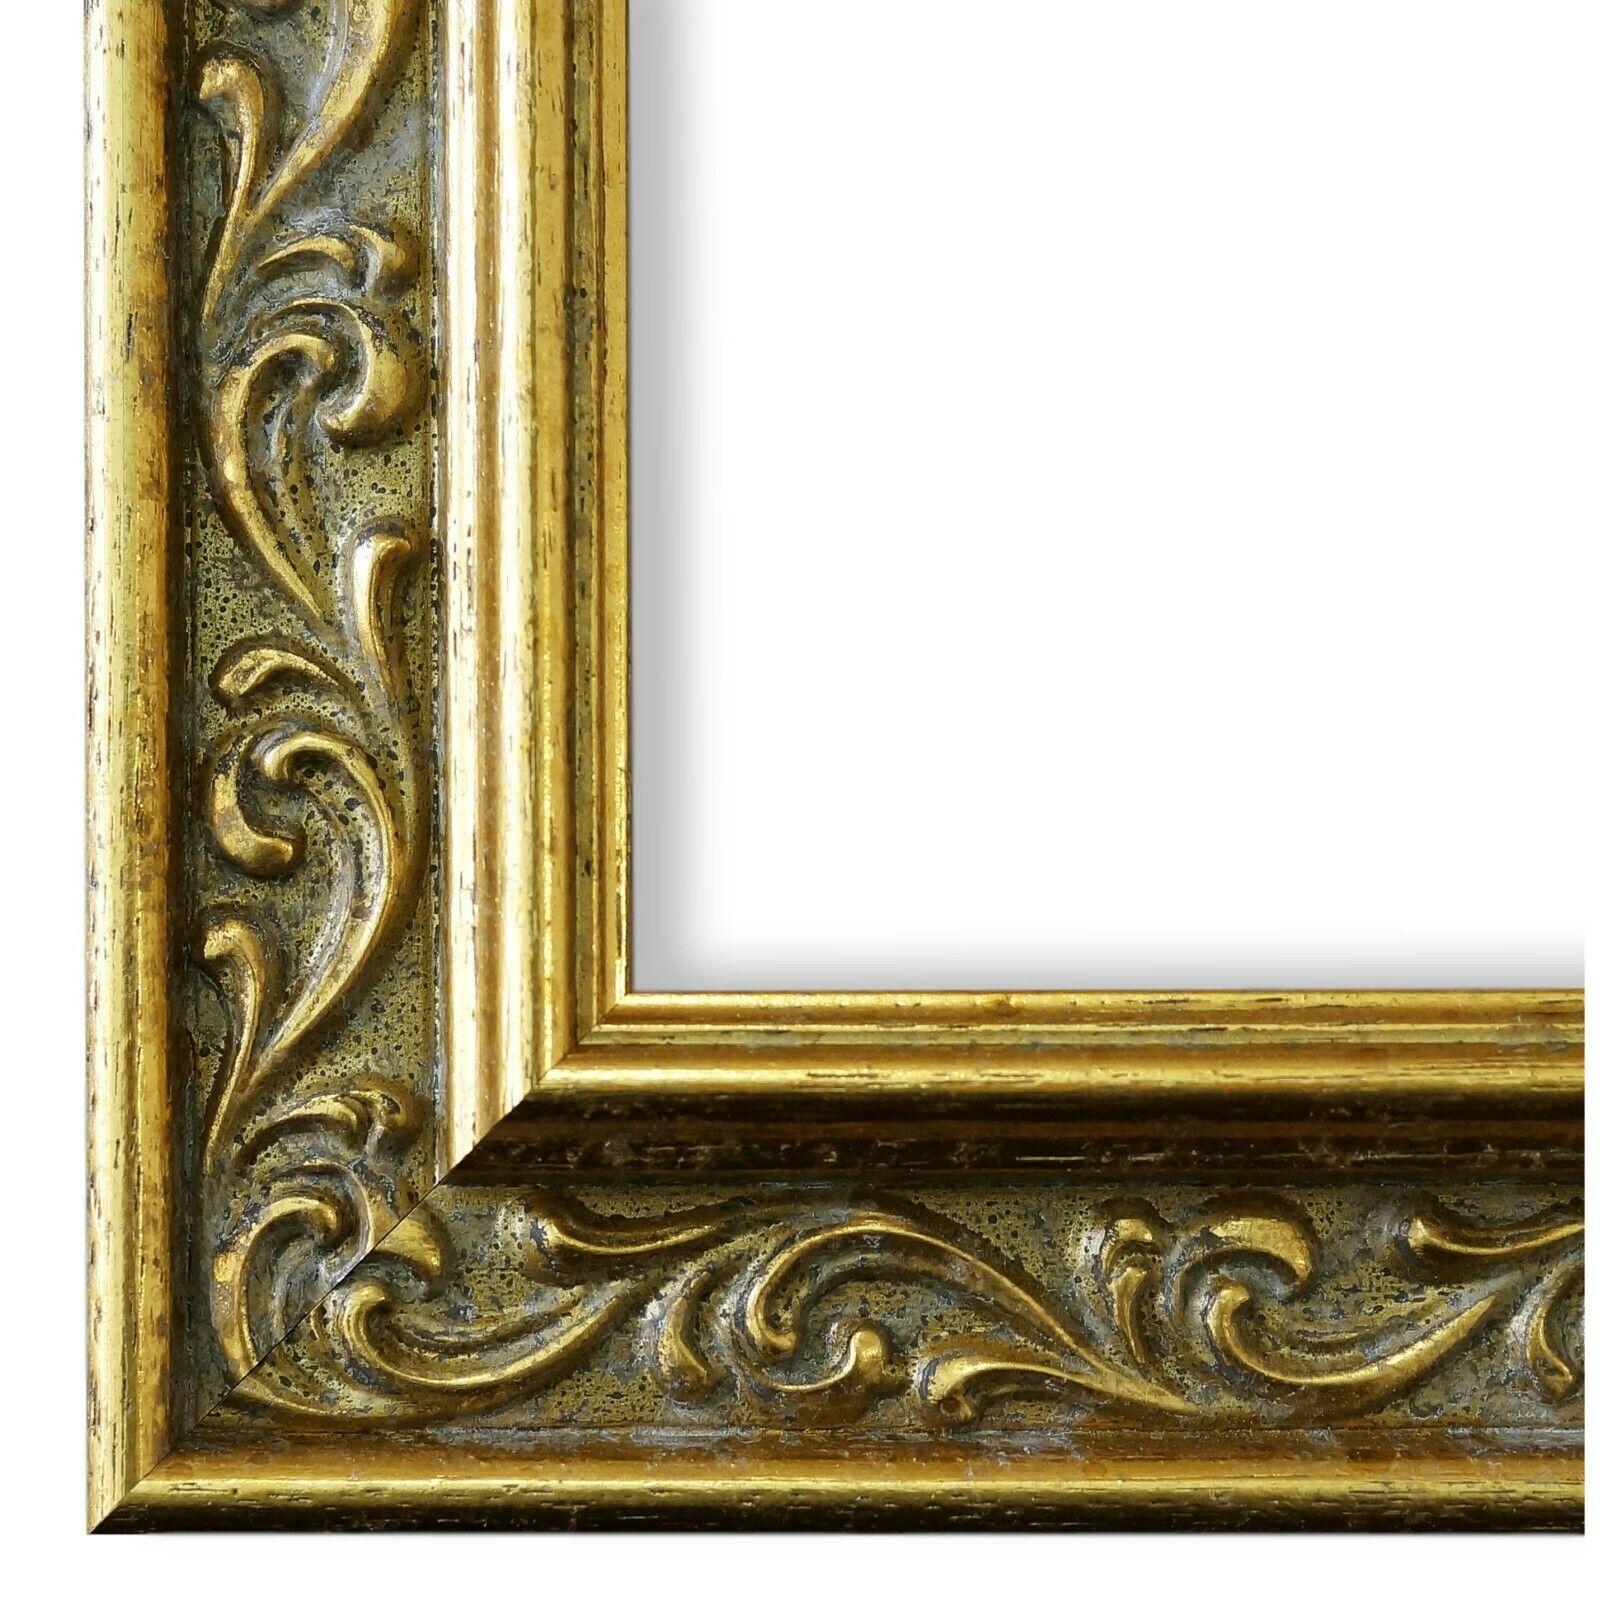 Bilderrahmen Verona Gold - 24x30 28x35 30x30 30x40 30x45 40x40 40x50